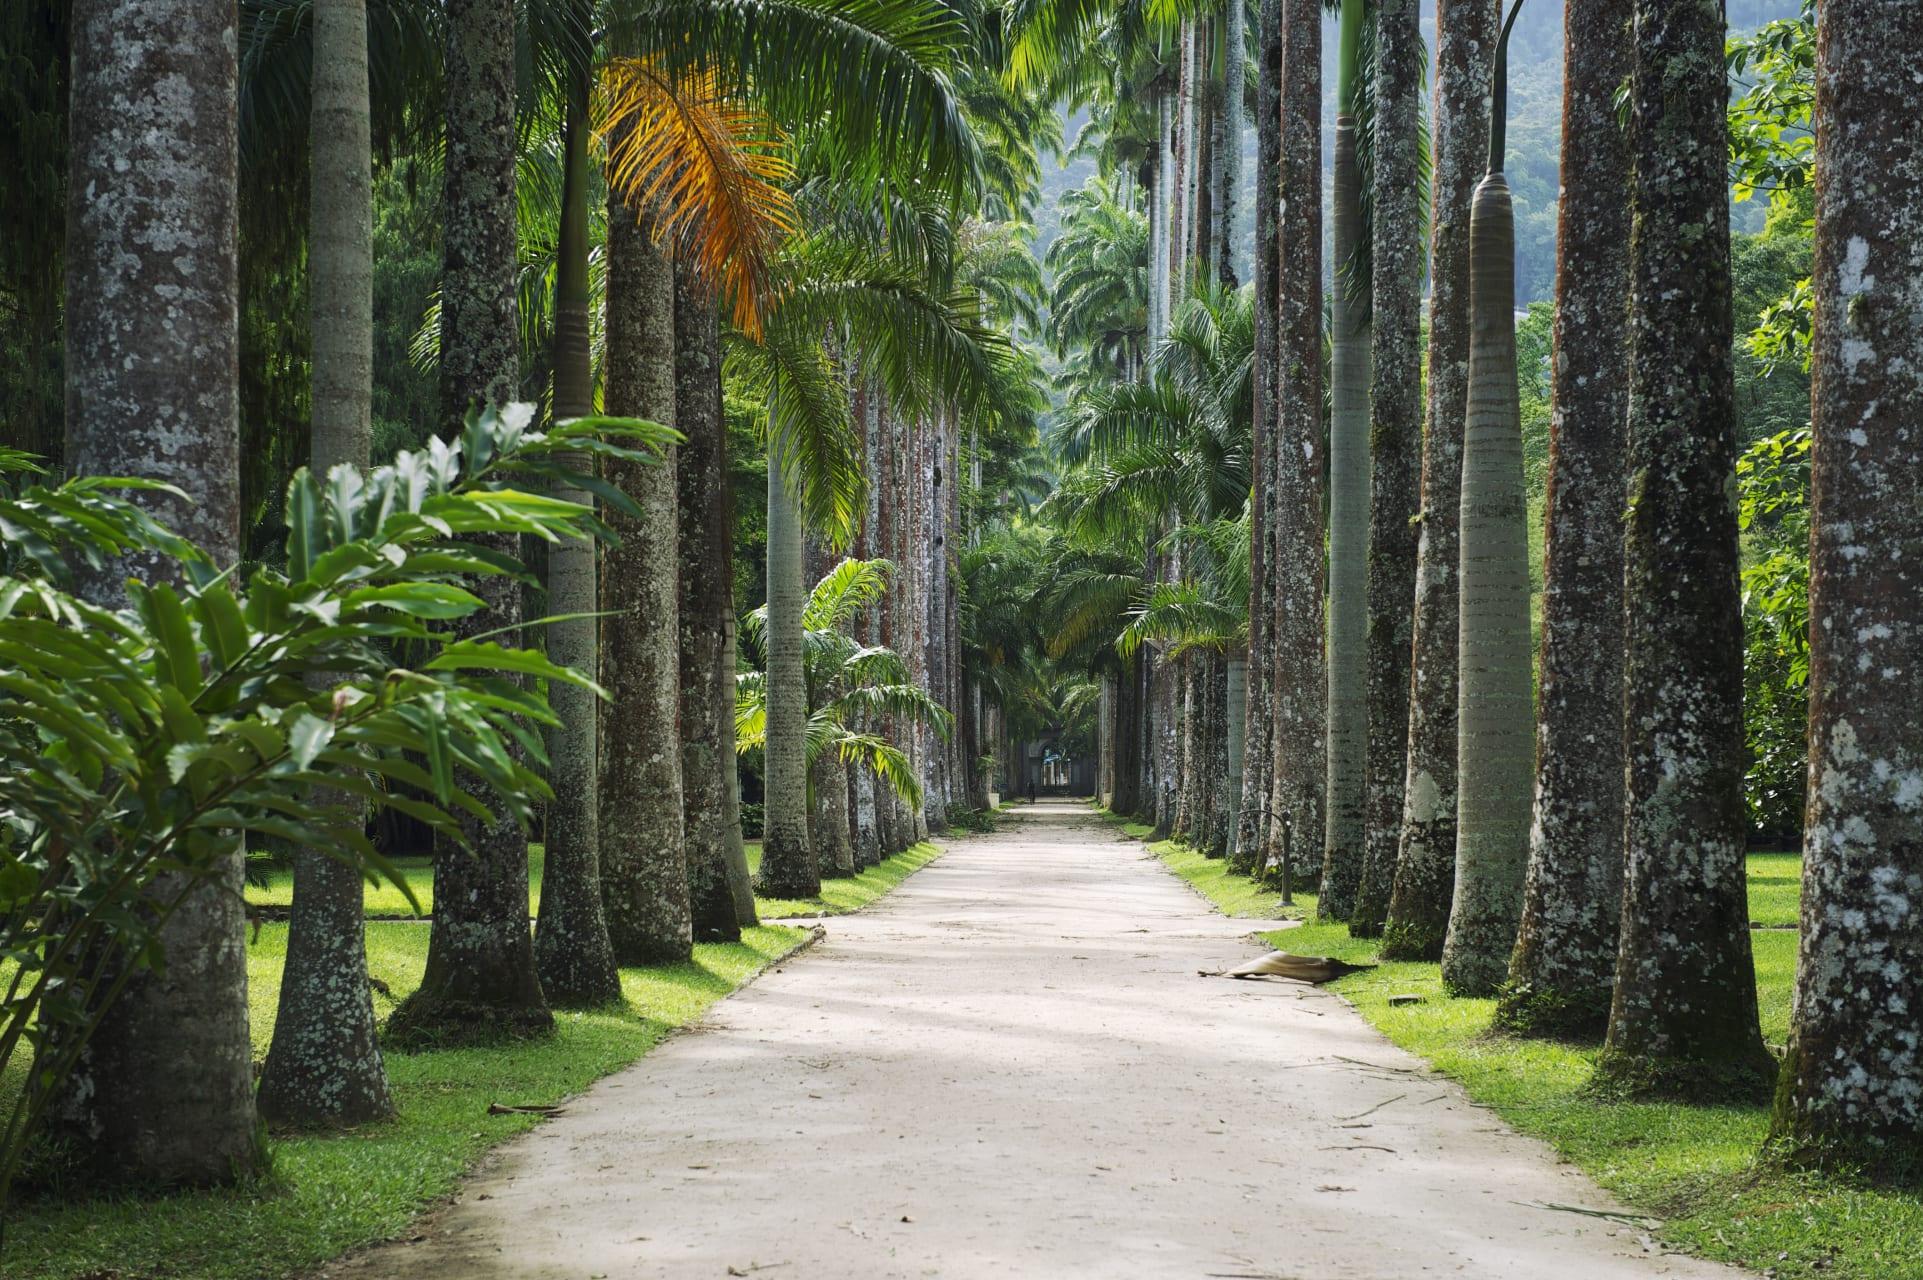 Rio de Janeiro - Jardim Botânico: Rio's Most Beautiful Garden